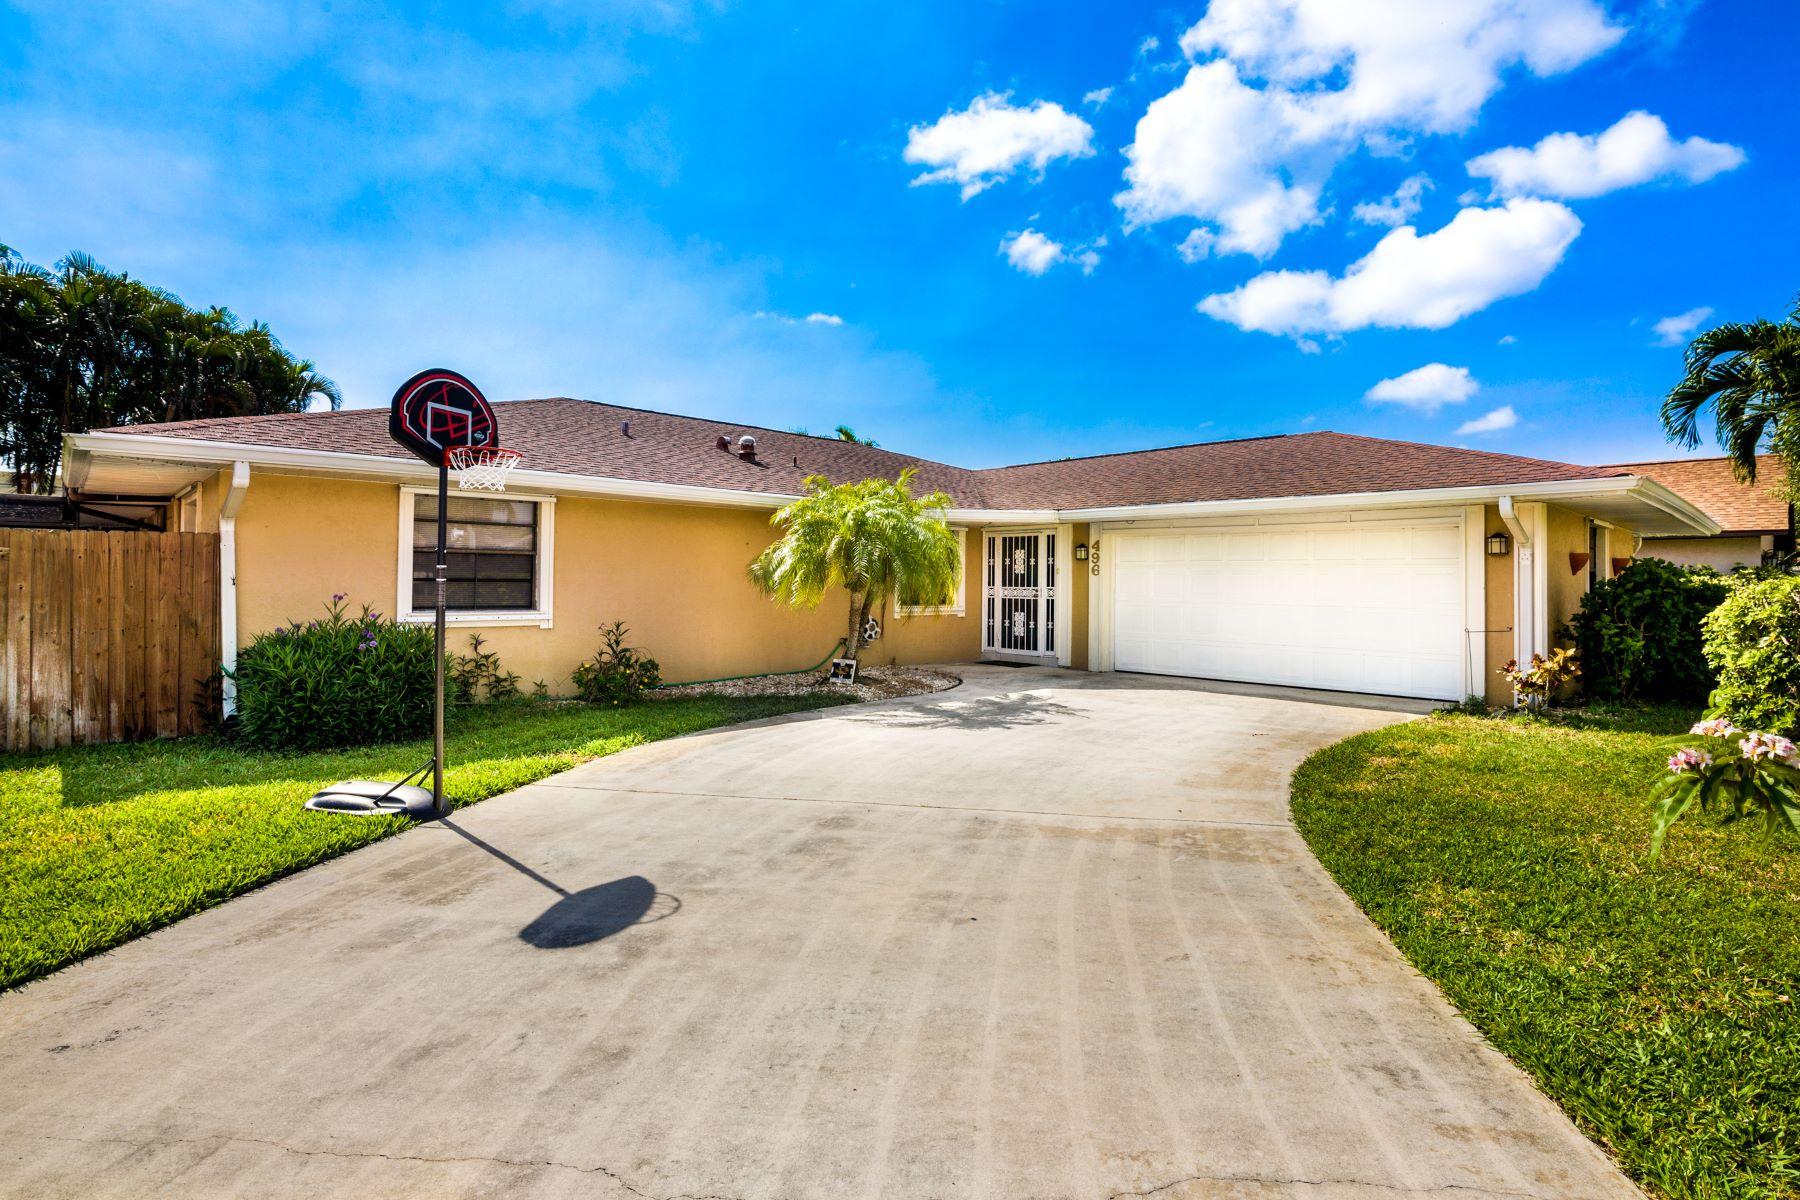 Single Family Homes for Sale at Tortoise View Estates 496 Tortoise View Circle Satellite Beach, Florida 32937 United States